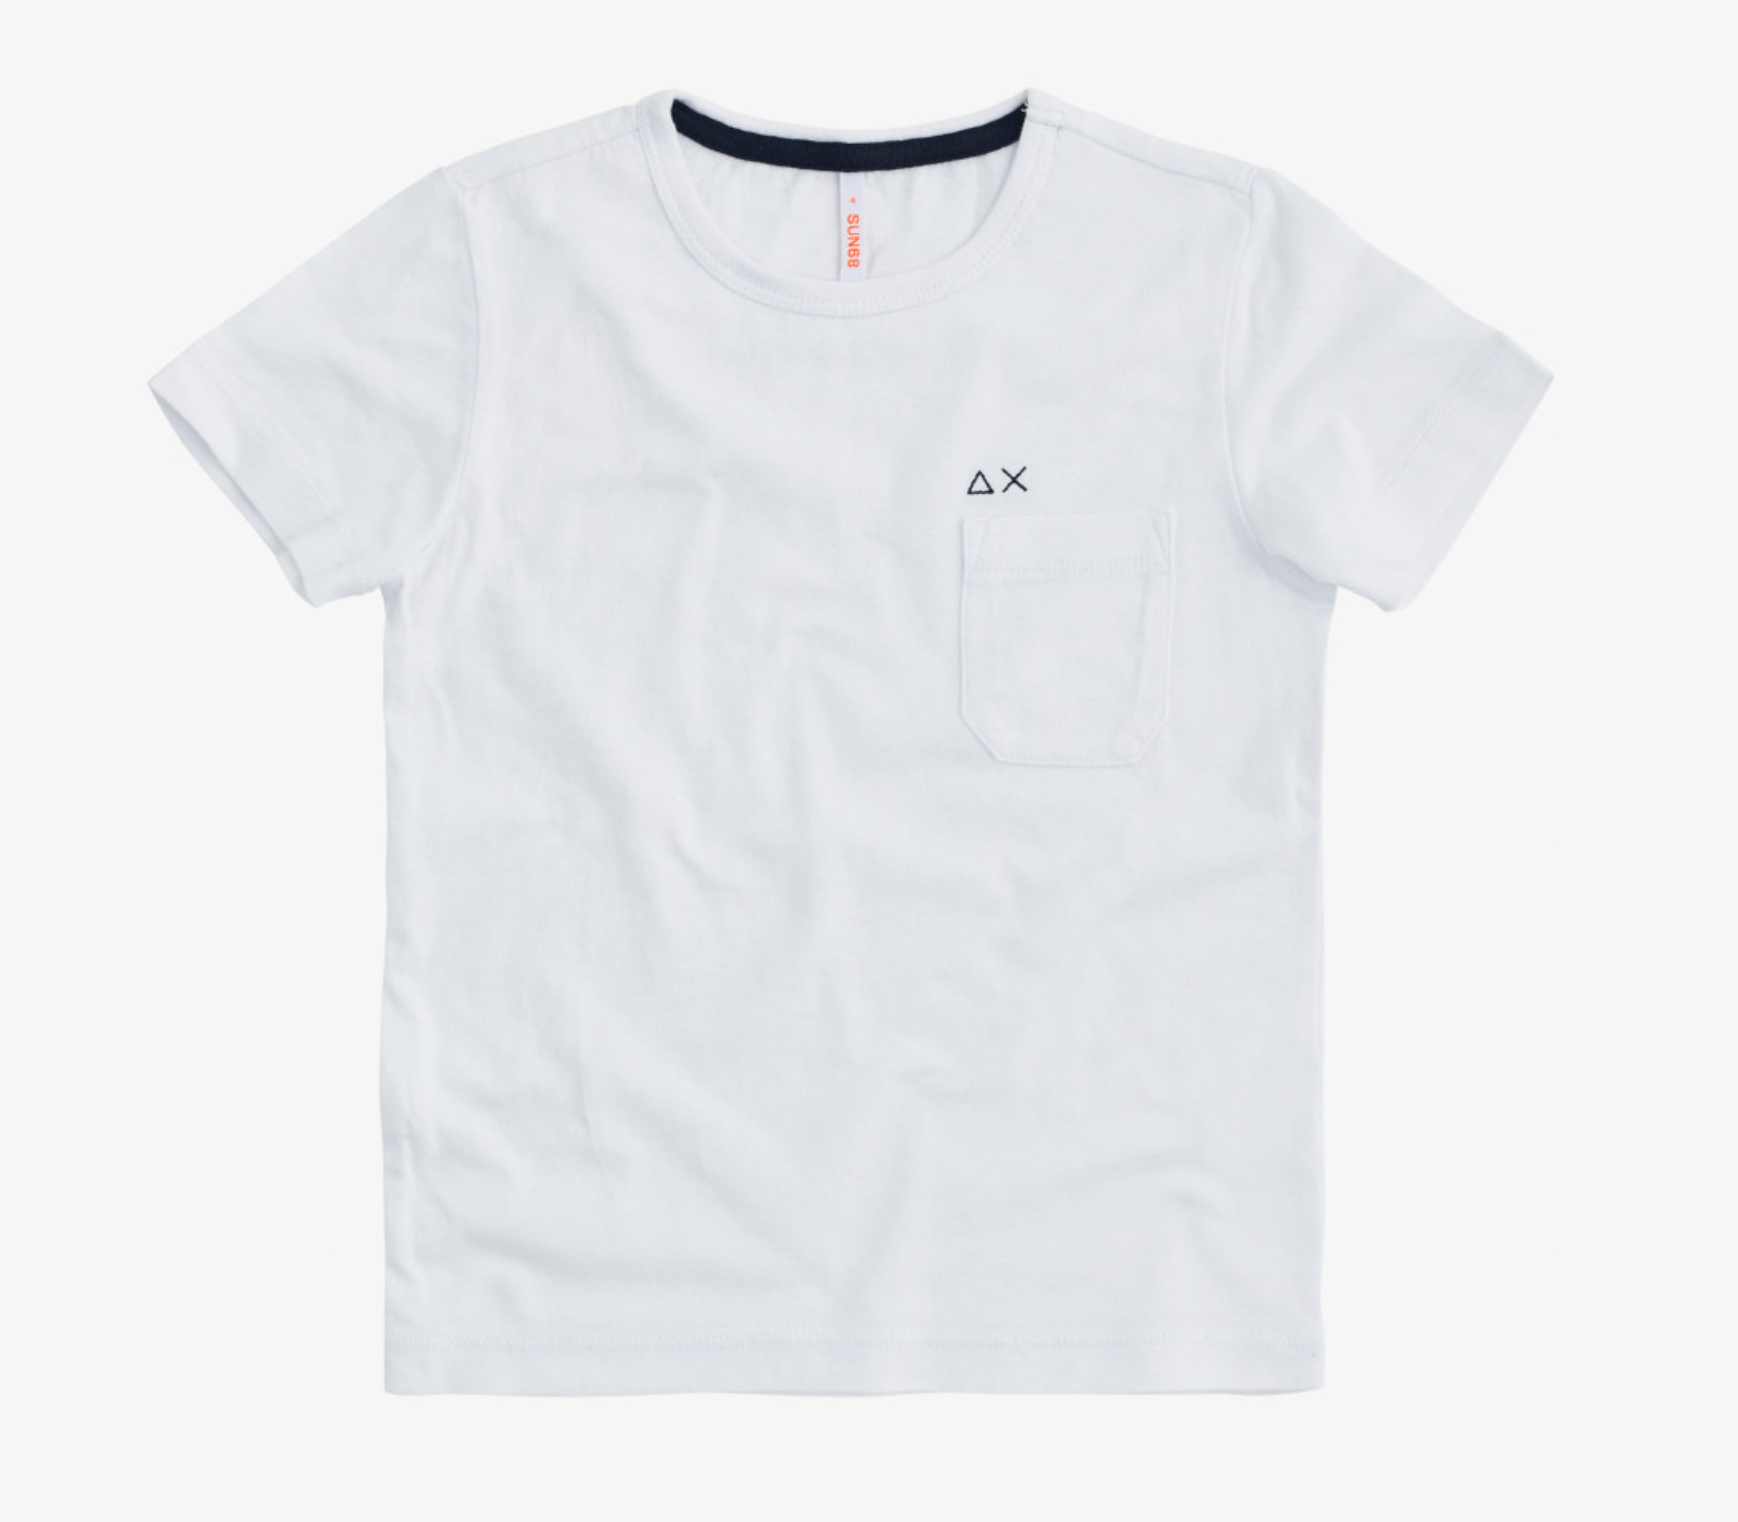 T- shirt Sun 68 bianca con taschino e logo a contrasto SUN68 | T-shirt | T3030101